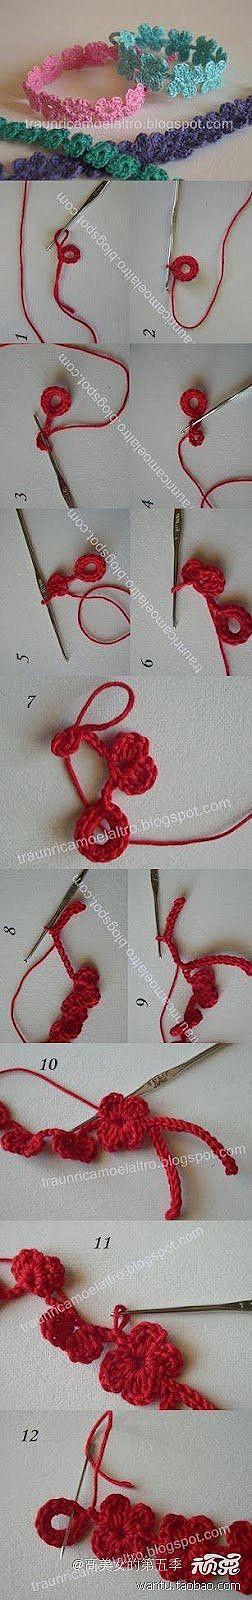 croched bracelet